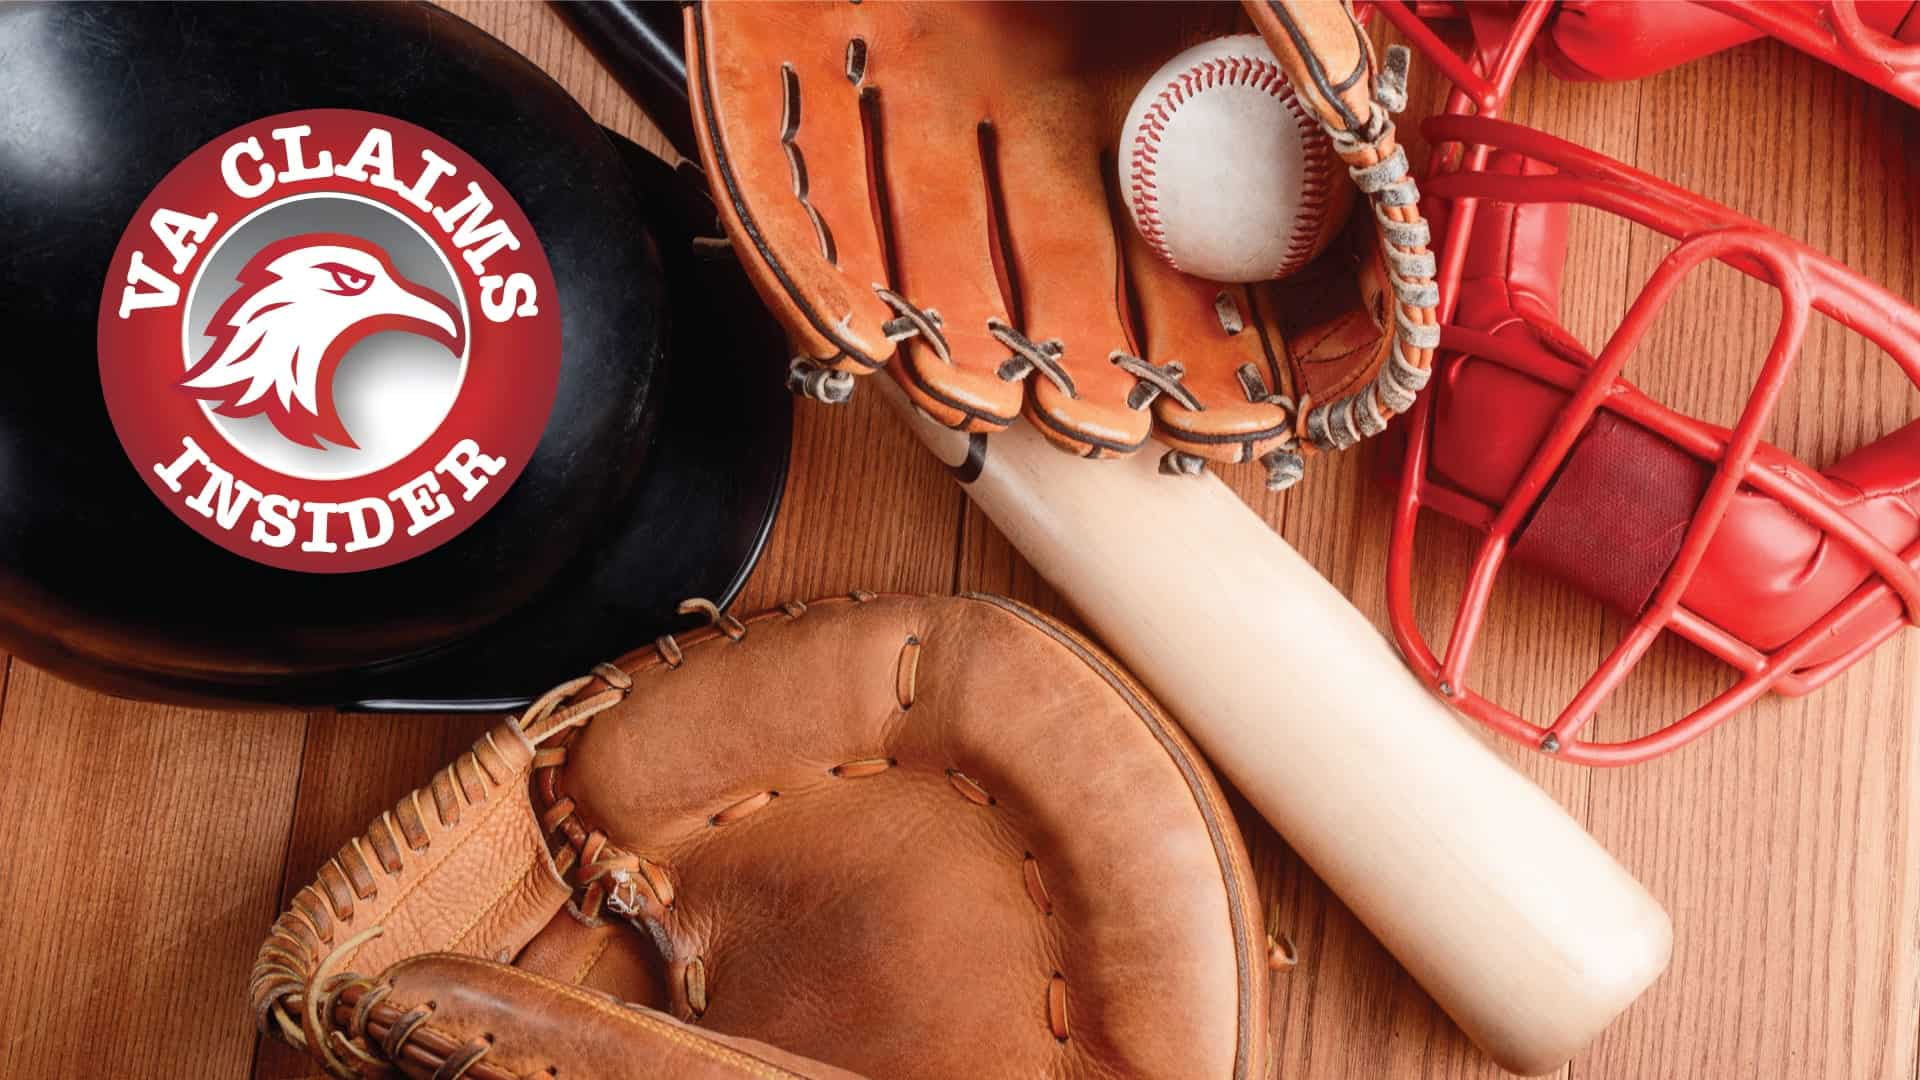 Sporting Goods Discounts for Veterans - VA Claims Insider